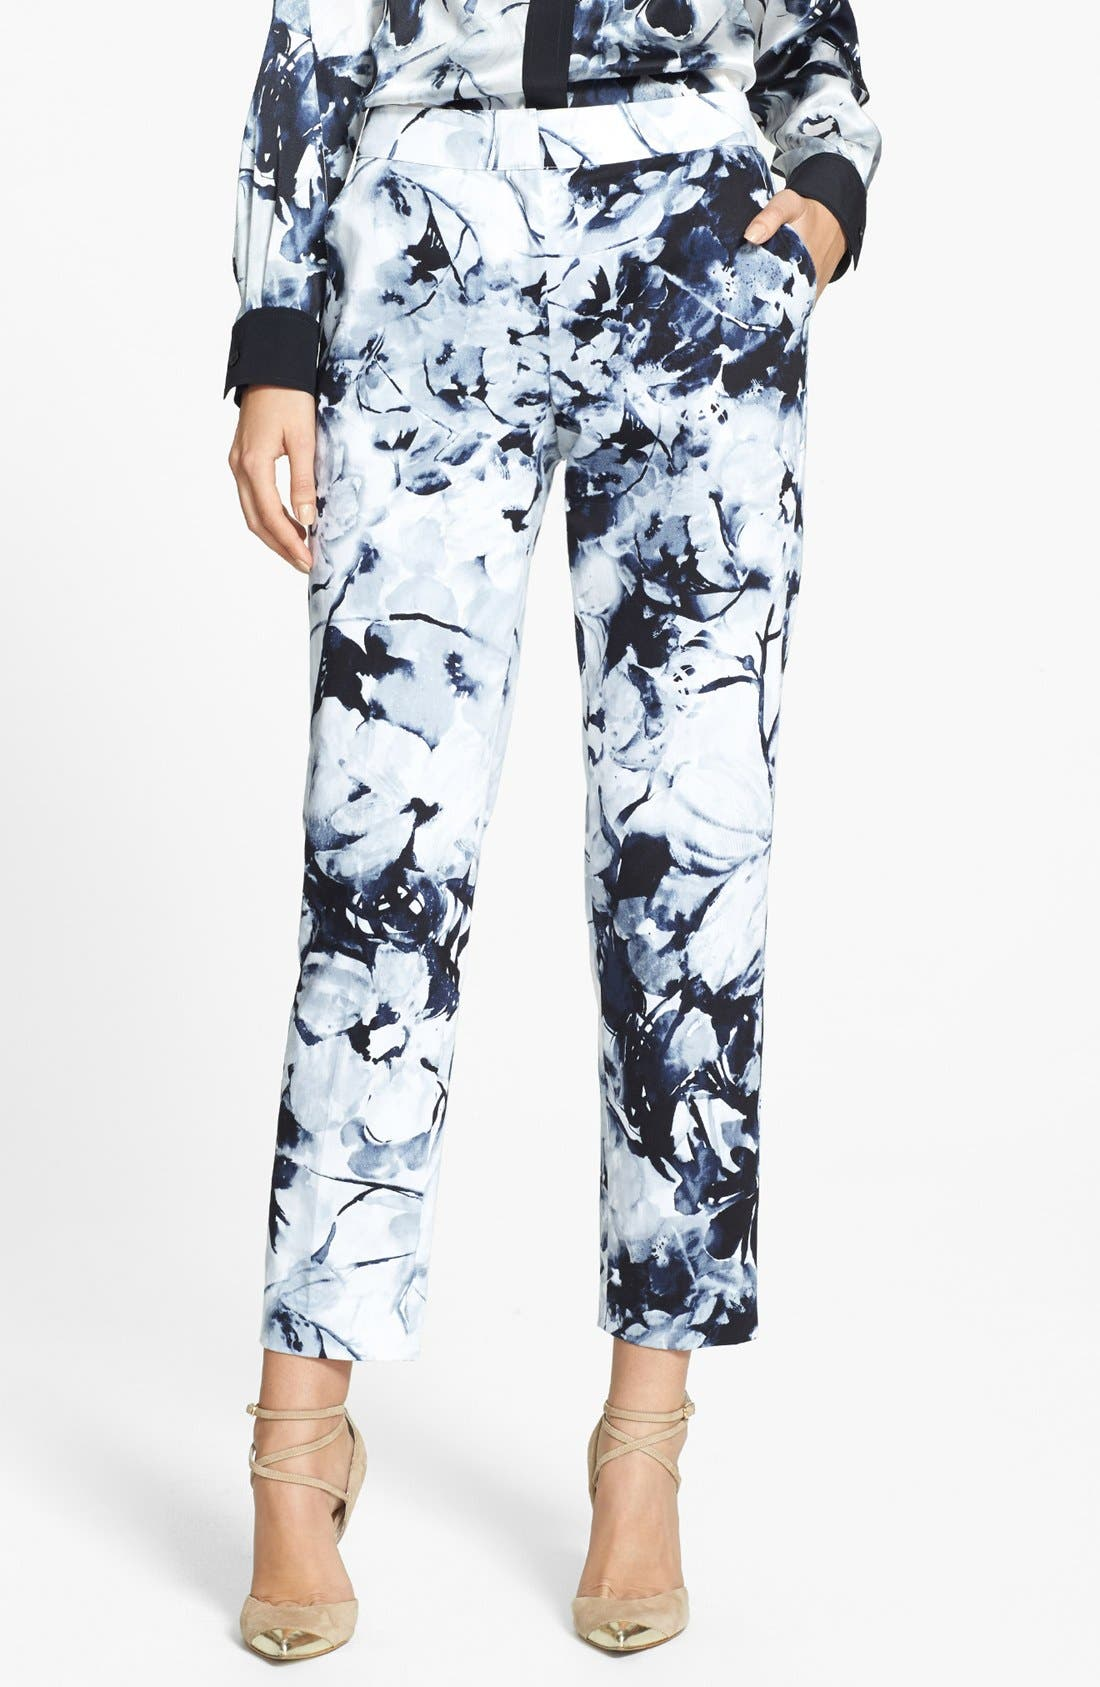 Main Image - St. John Yellow Label 'Emma' Floral Print Cotton Sateen Crop Pants